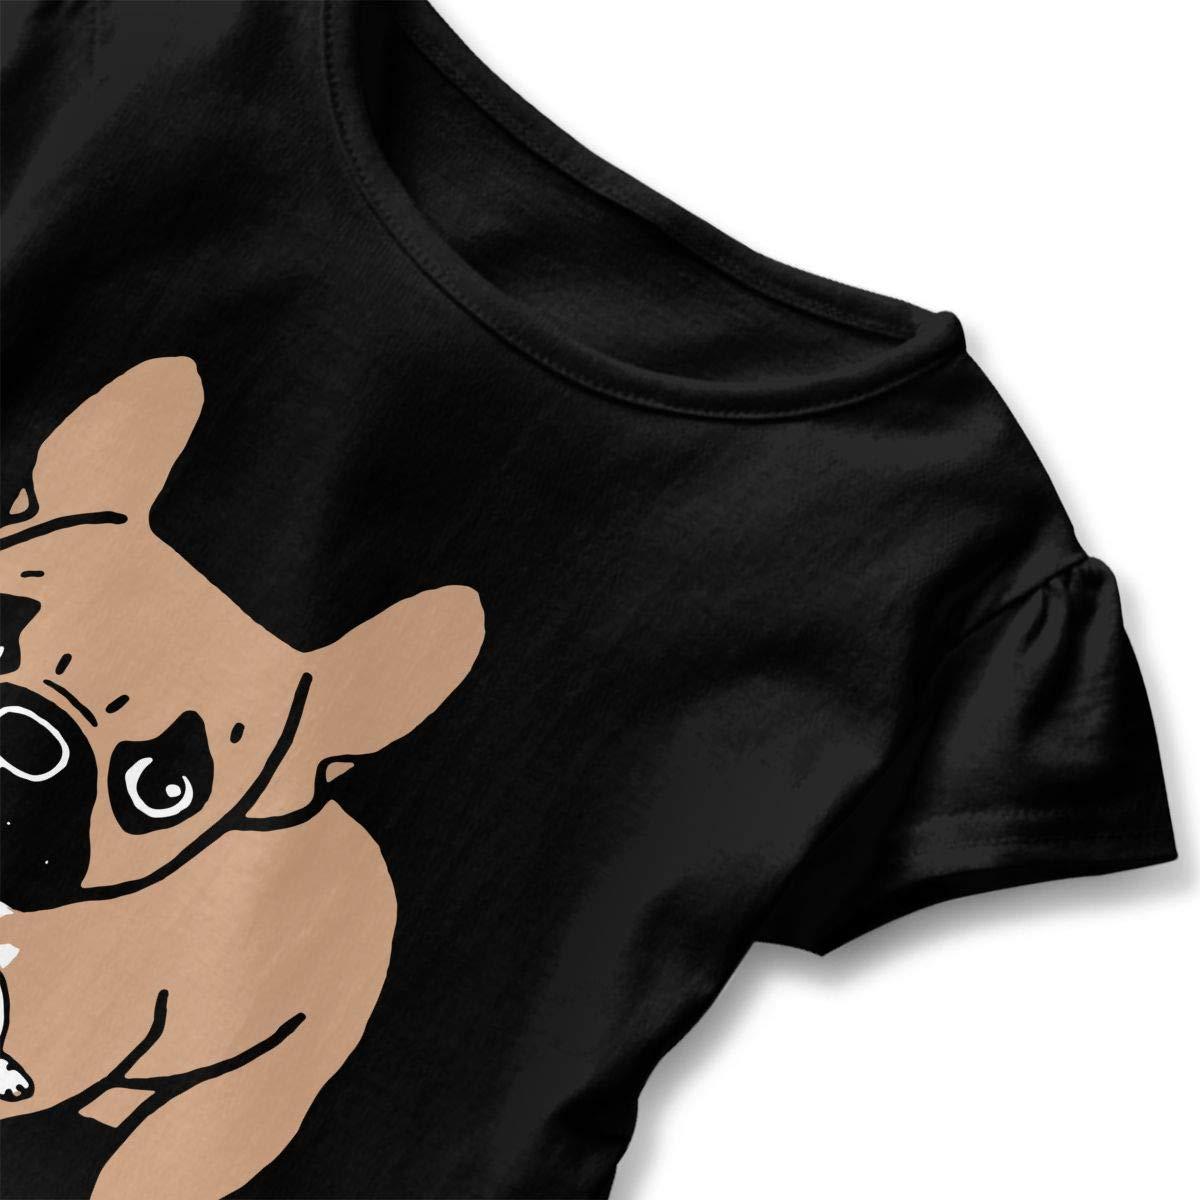 French Bulldog Drunking Juice Kids Girls Short Sleeve Ruffles Shirt Tee for 2-6 Toddlers